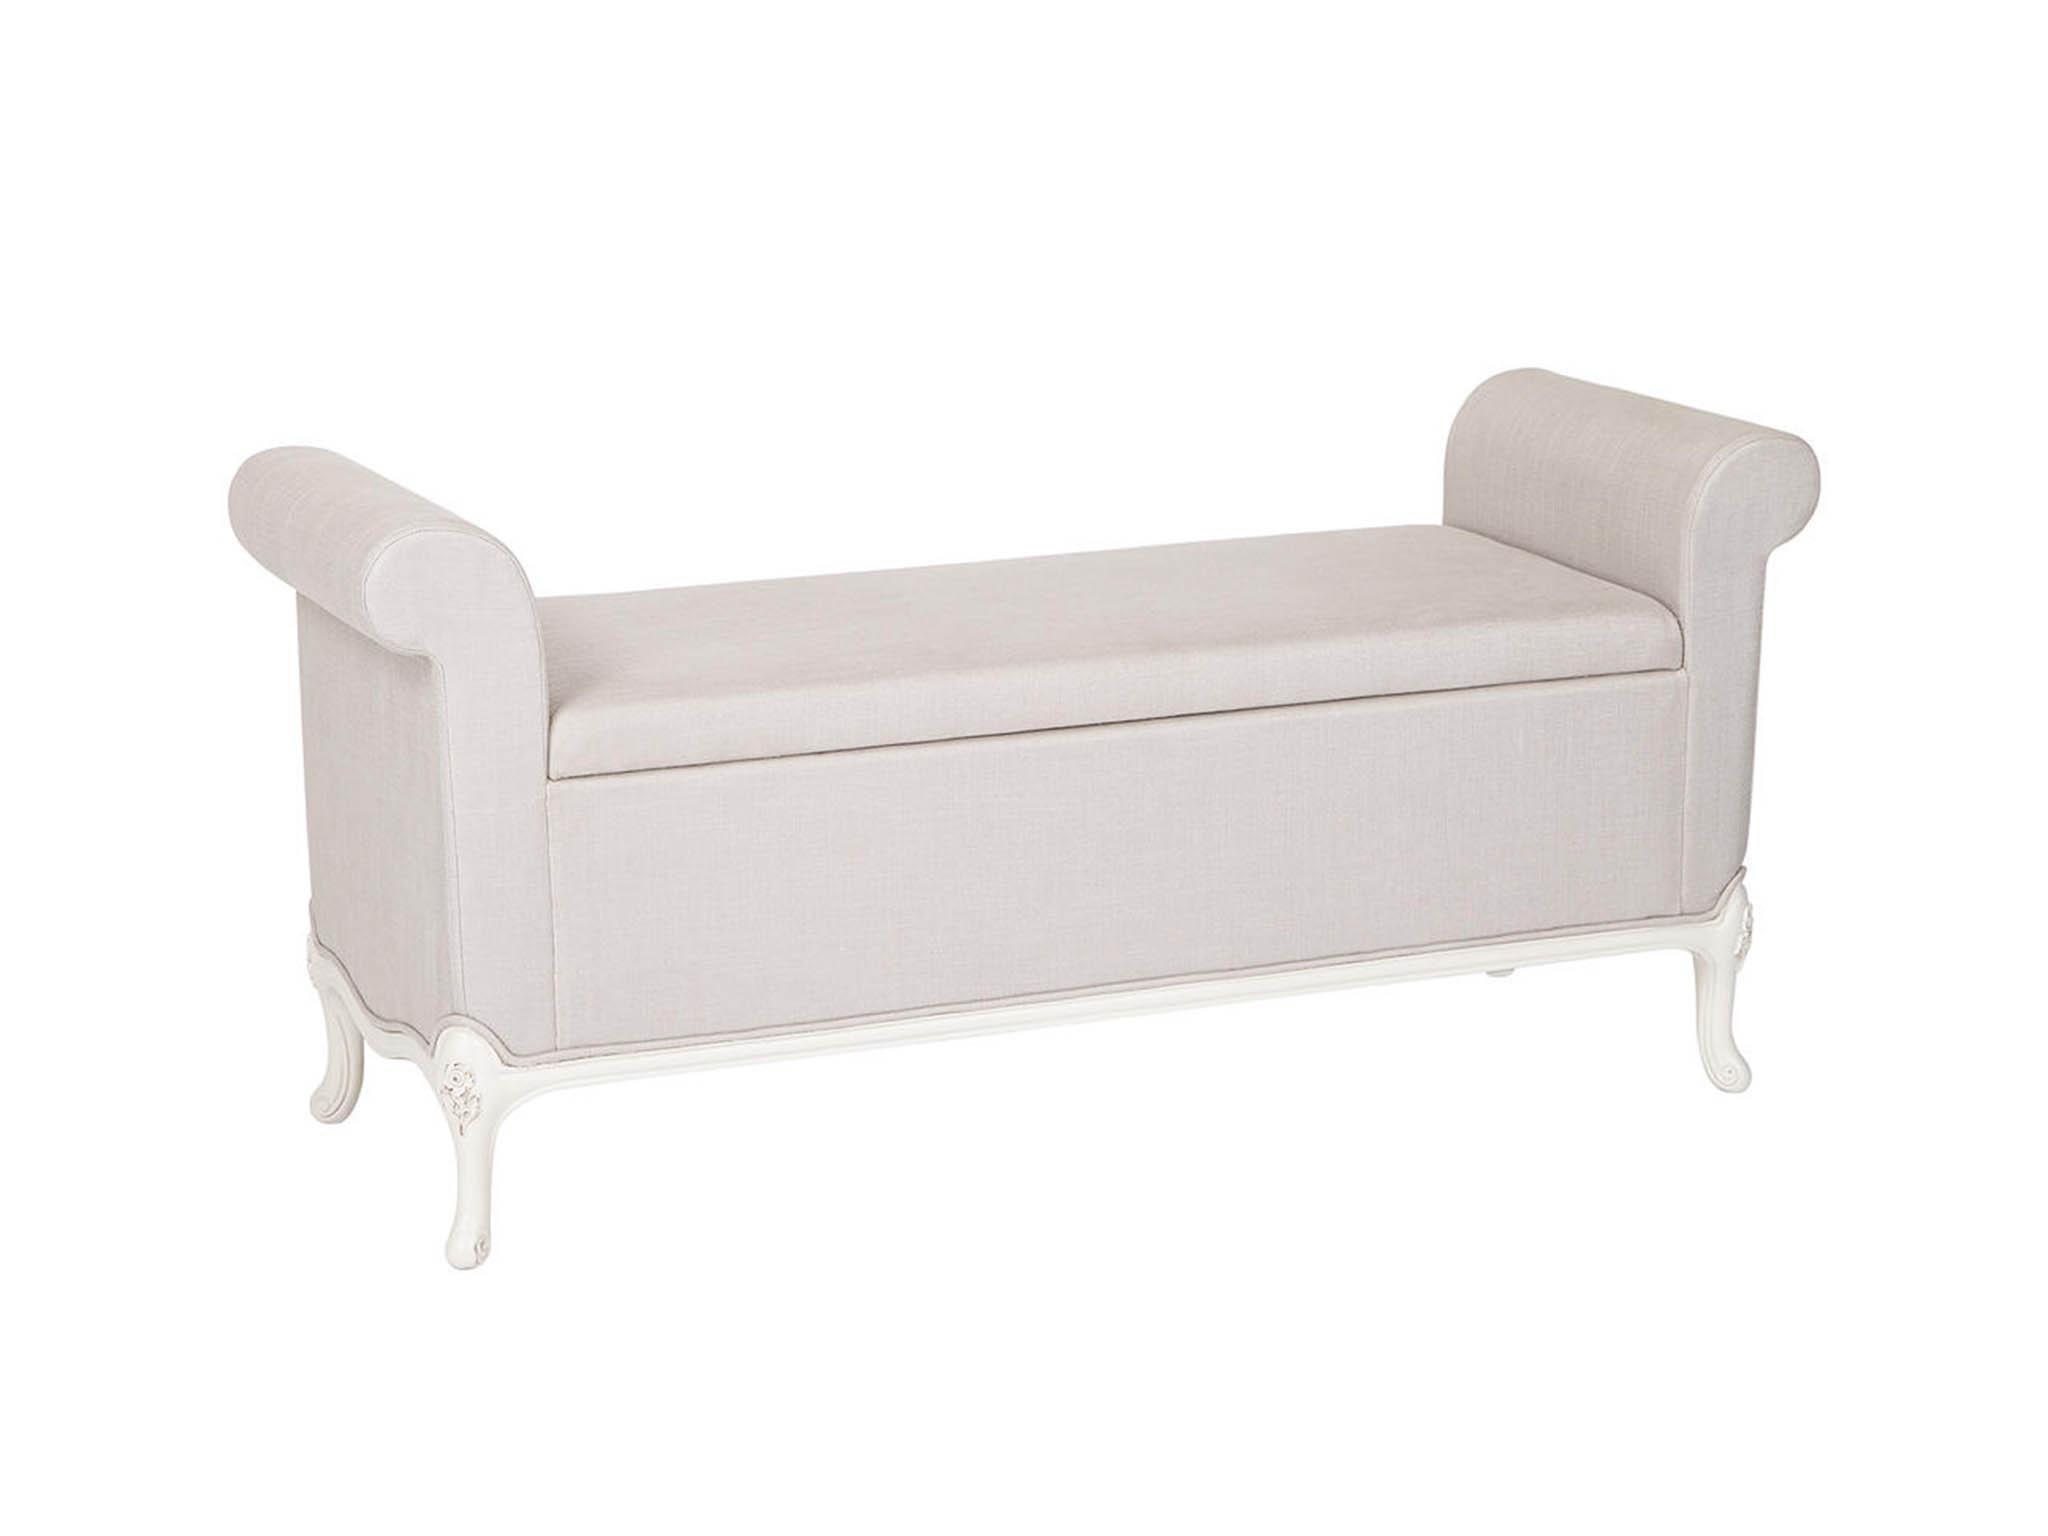 Phenomenal 10 Best Seating Storage Solutions The Independent Inzonedesignstudio Interior Chair Design Inzonedesignstudiocom